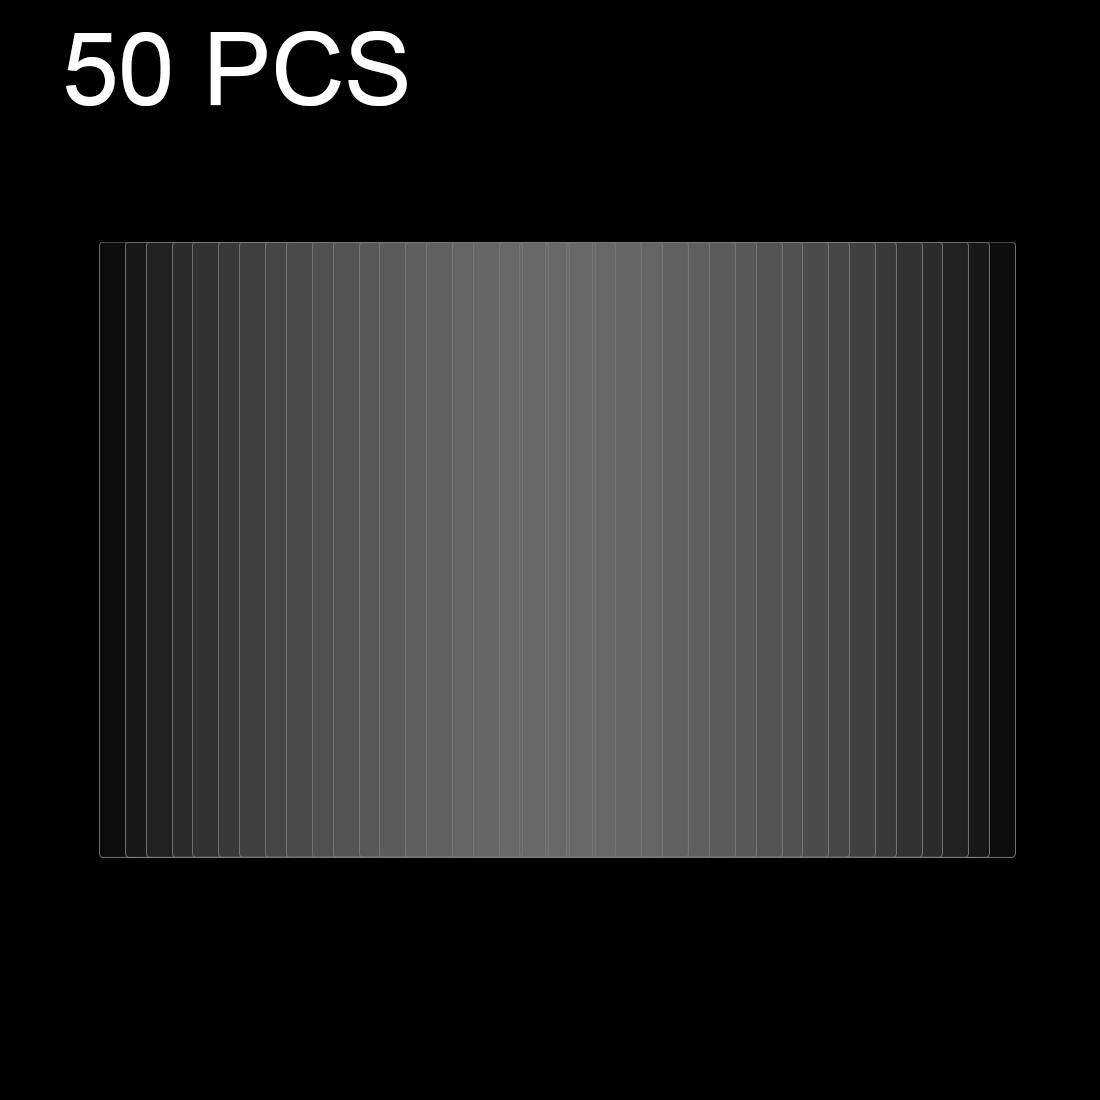 Cek Harga Baru M Home Anti Crash Shatter Proof 3d Curved Screen Blackberry Keyone Tempered Glass Full Cover Ampamp Black 50 Pcs For 026mm 9h Surface Hardness 25d Edge